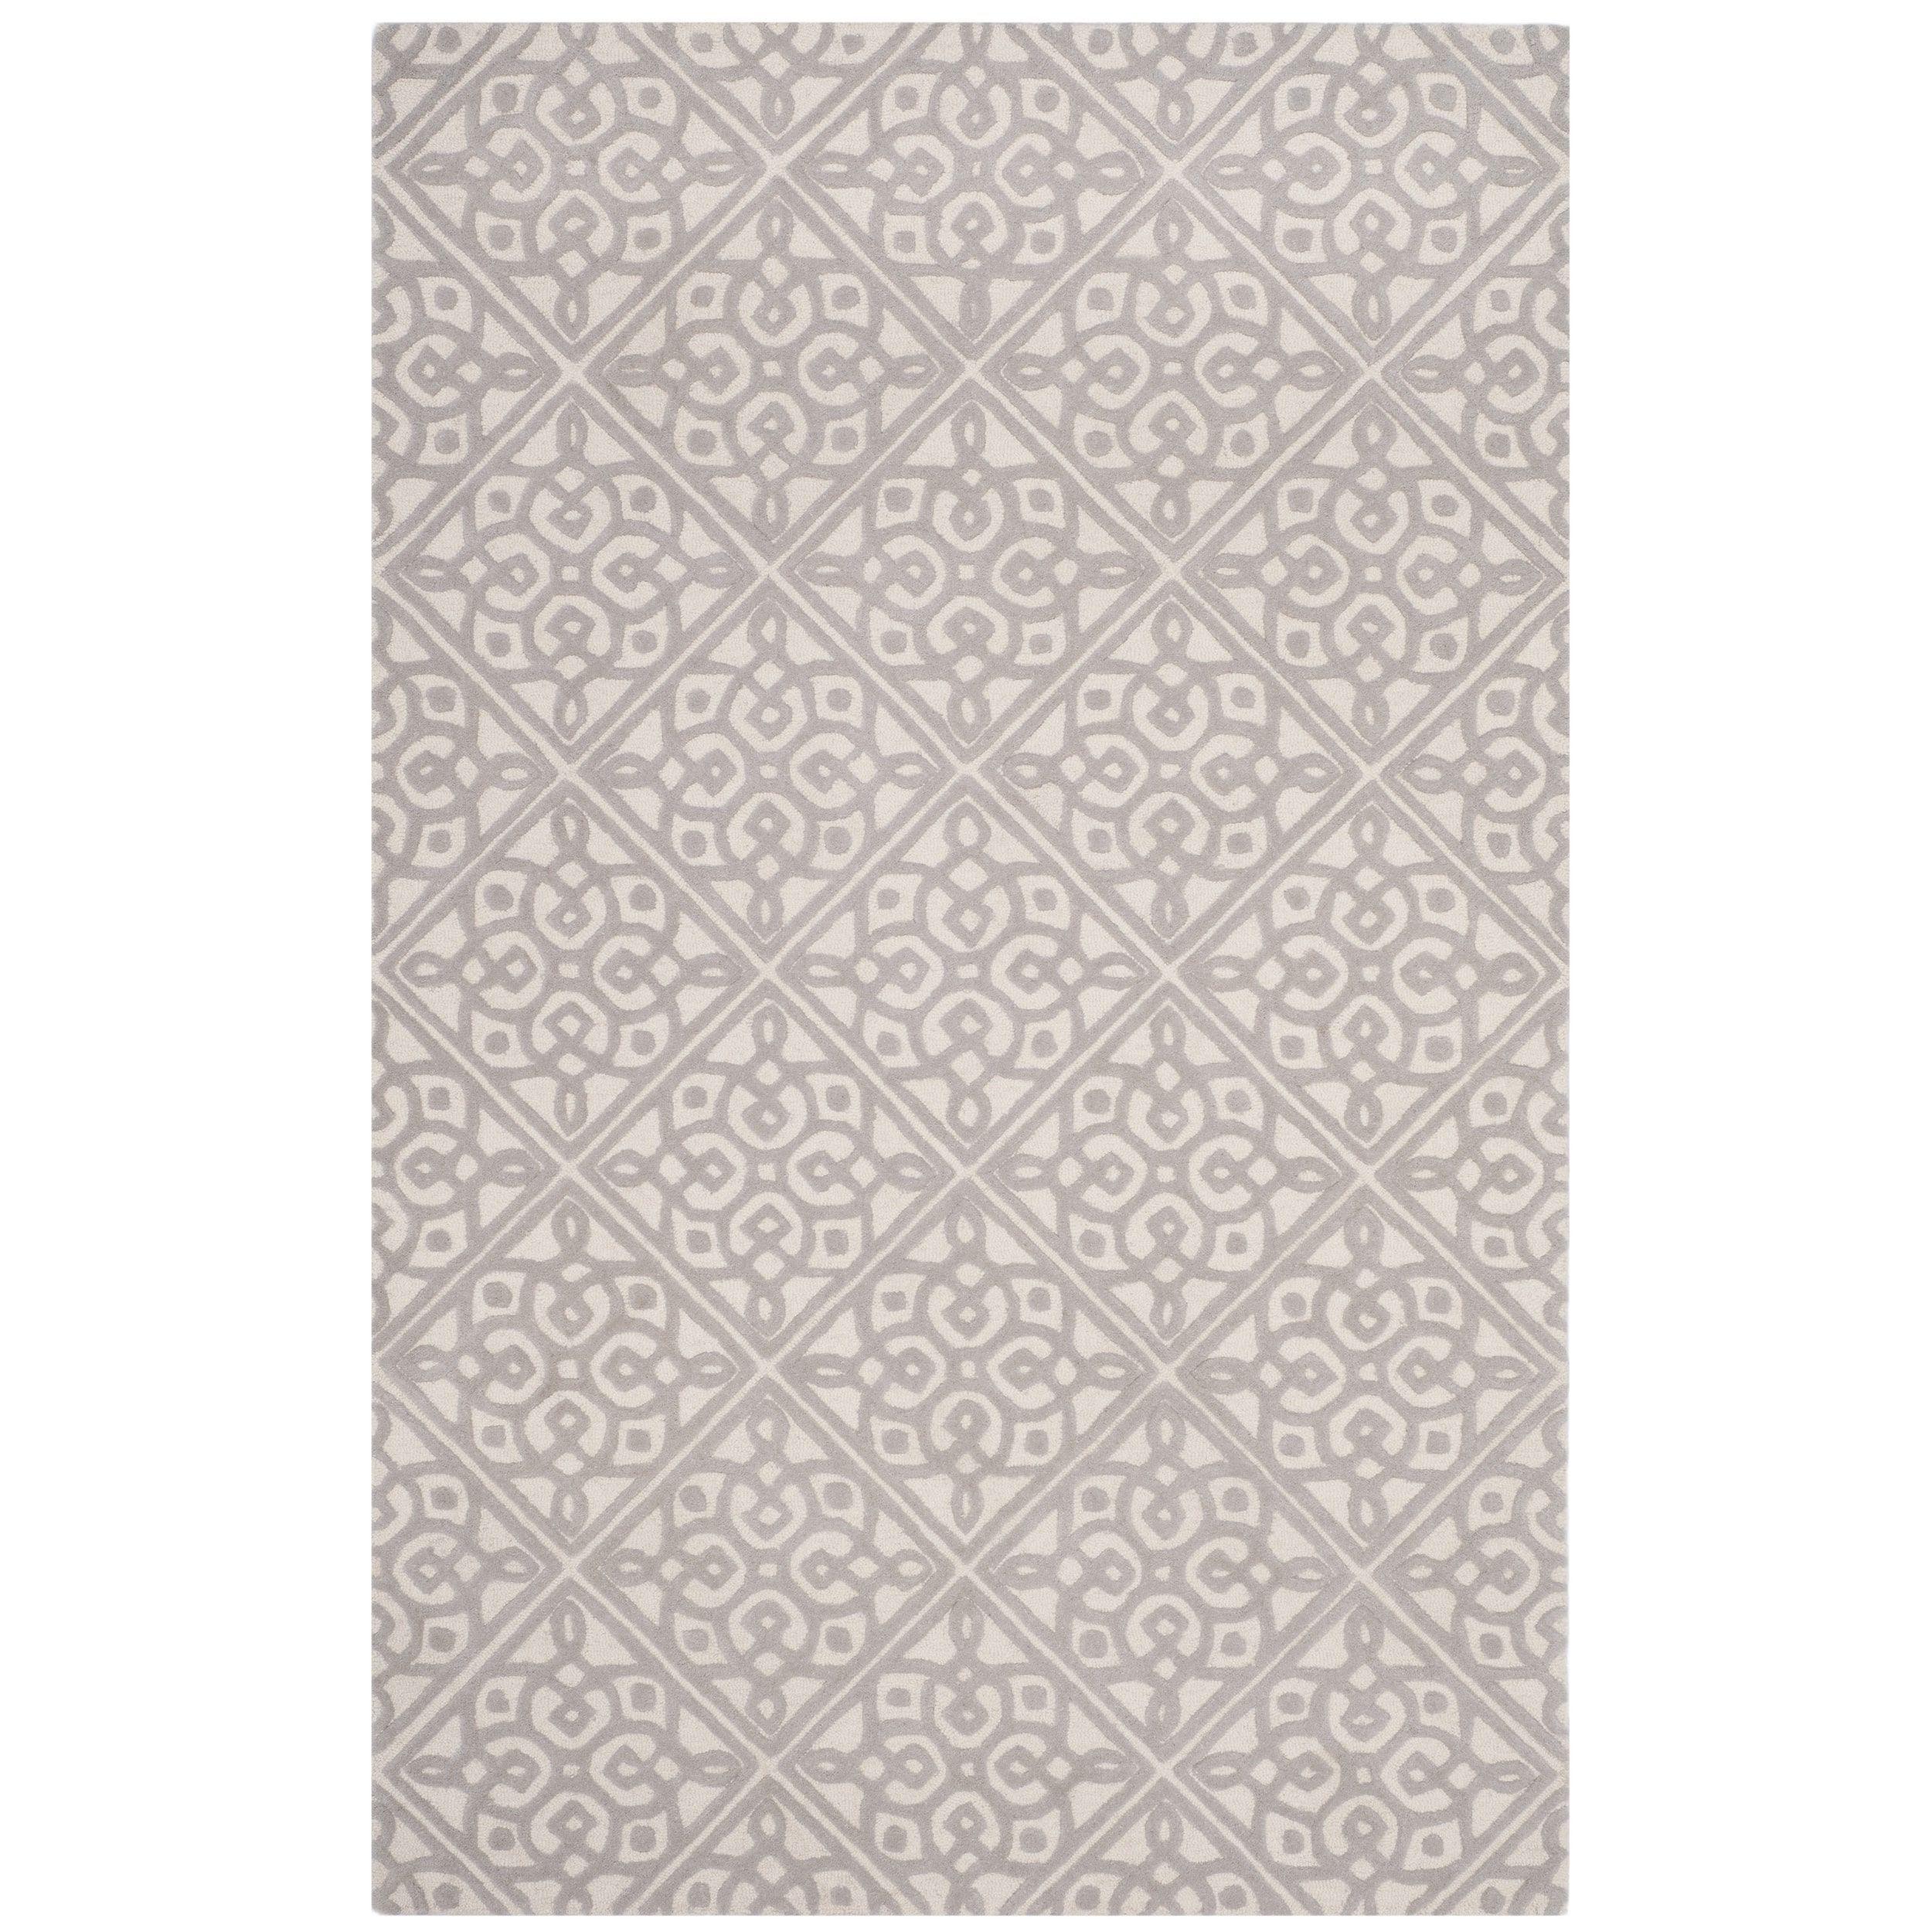 Safavieh Cambridge Transitional Geometric Hand-Tufted Wool Ivory/ Grey Area Rug (4' x 6') (CAM731Q-4), Size 4' x 6'